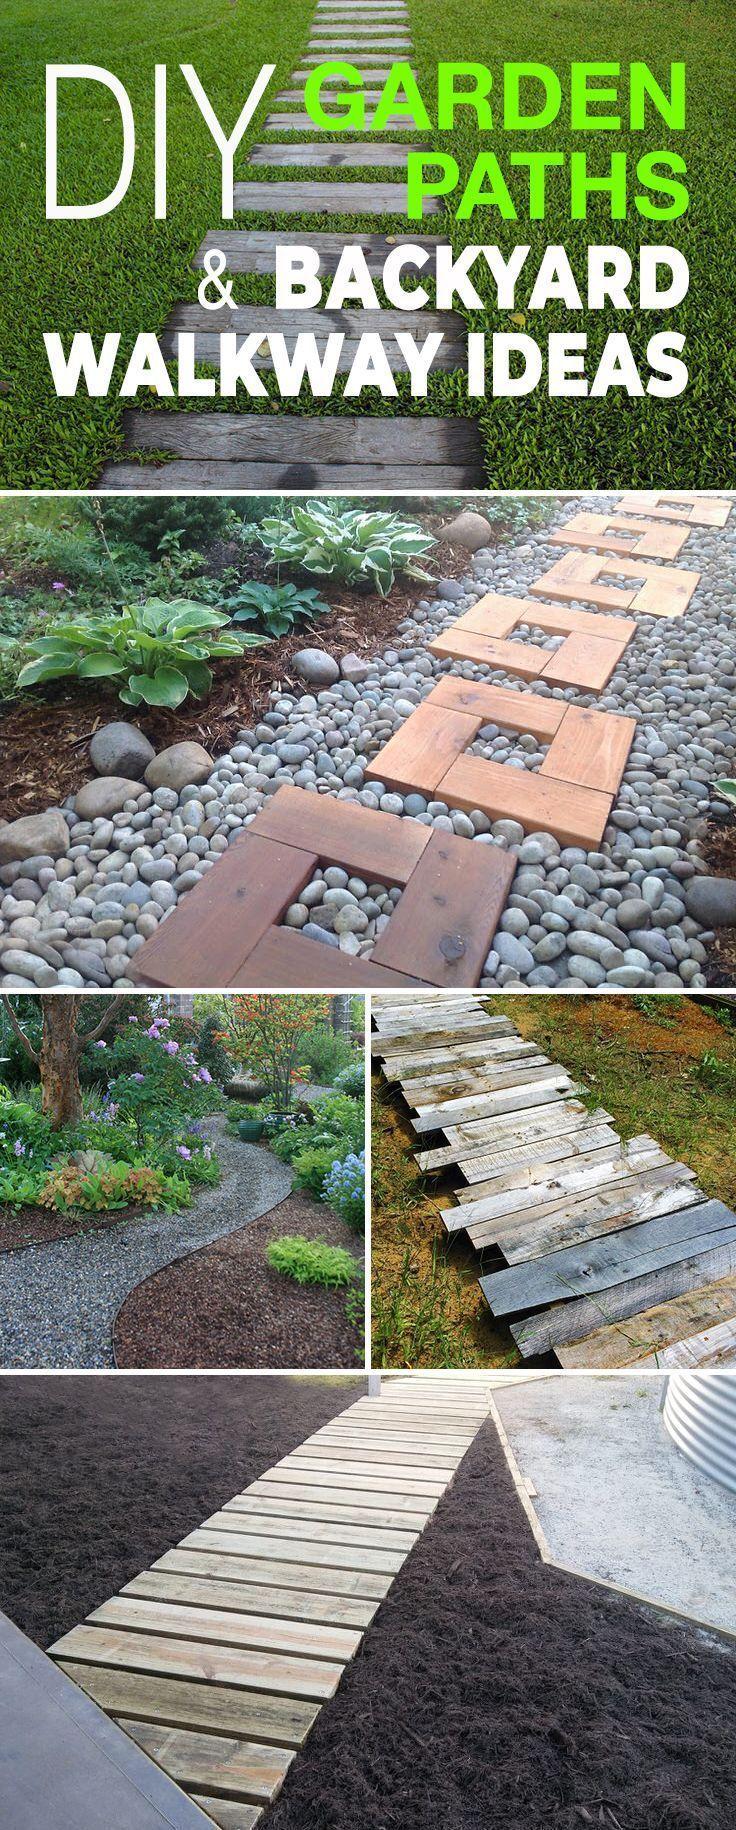 Photo of DIY Garden Paths And Backyard Walkway Ideas | The Garden Glove